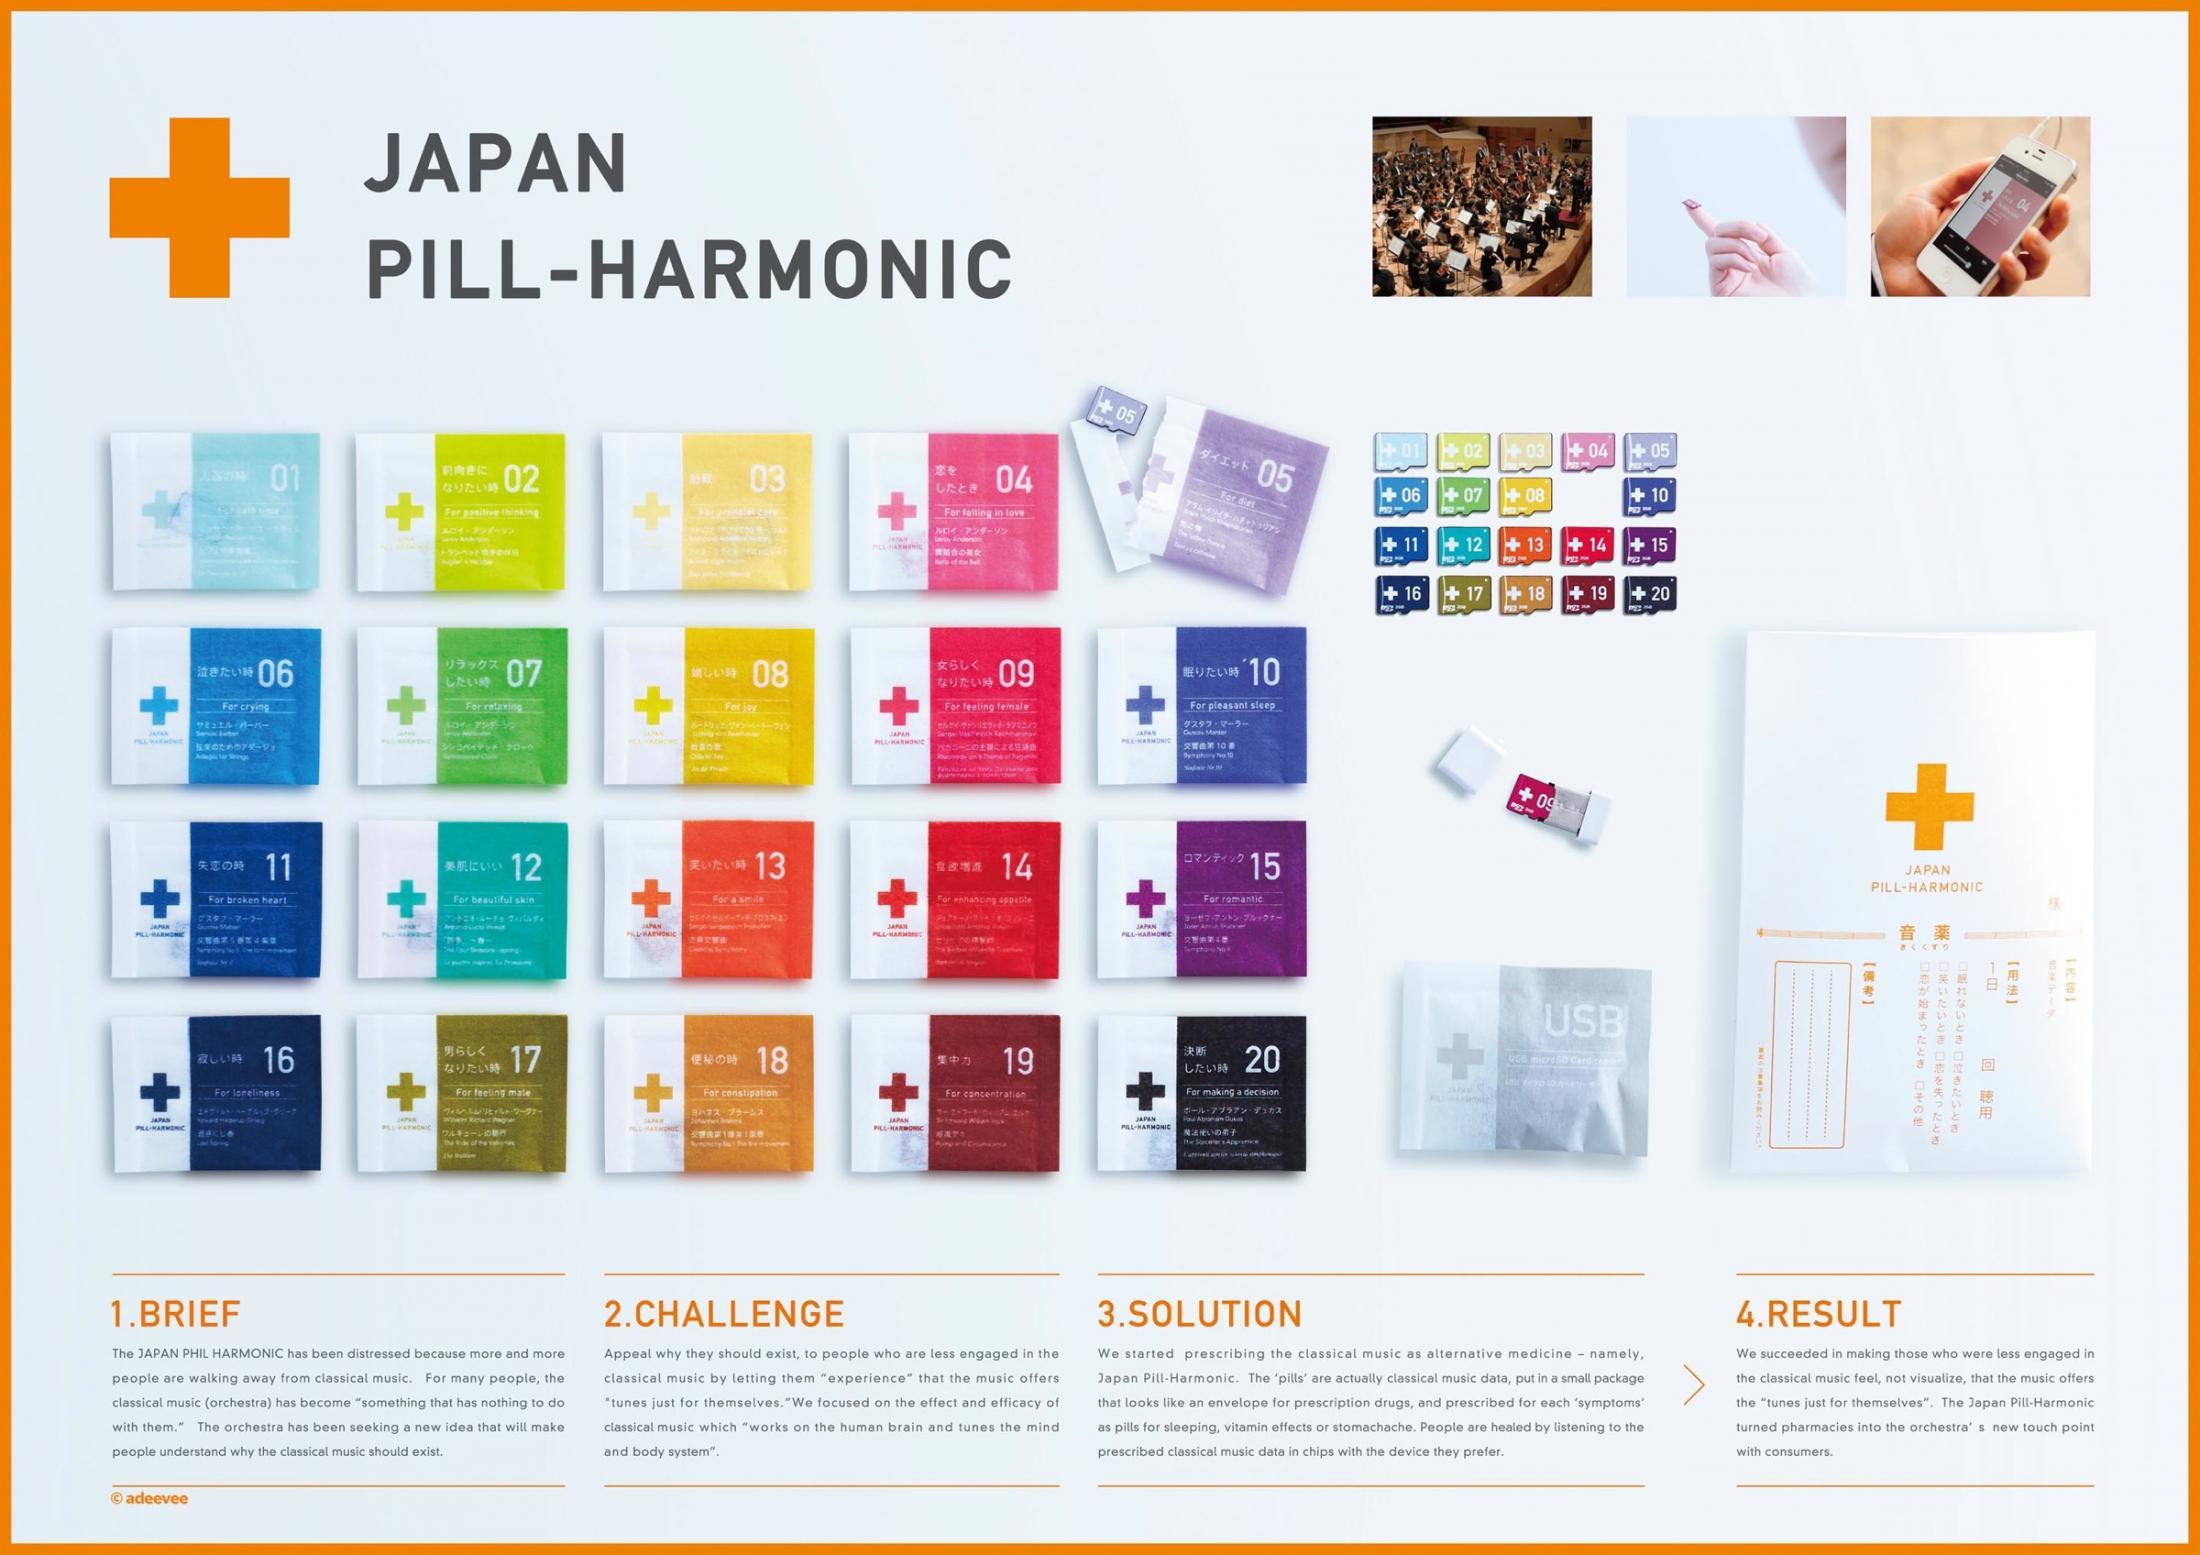 Japan Philharmonic Orchestra Direct Ad -  The Japan Pill-harmonic